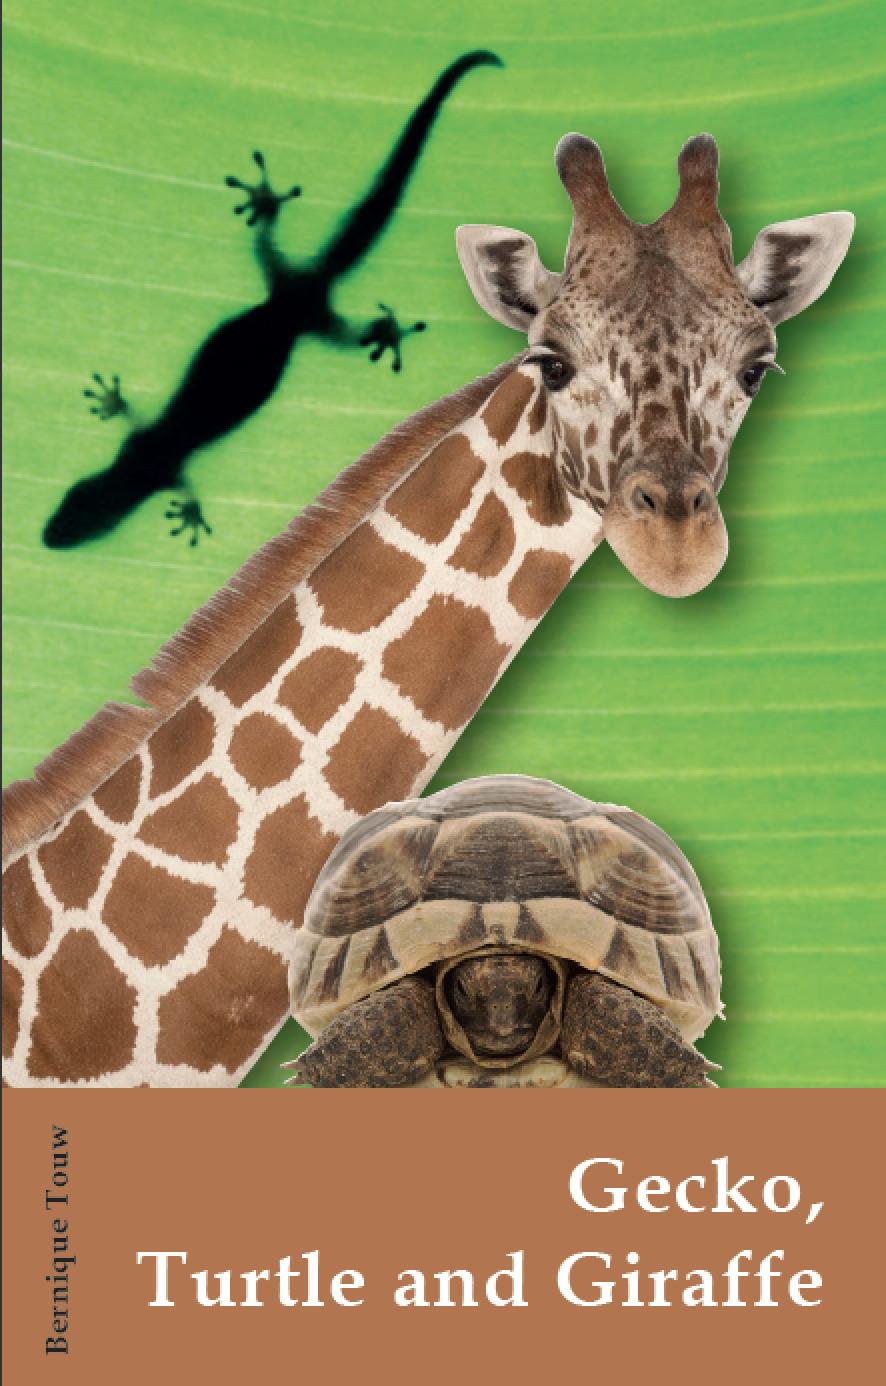 Gecko, Turtle and Giraffe